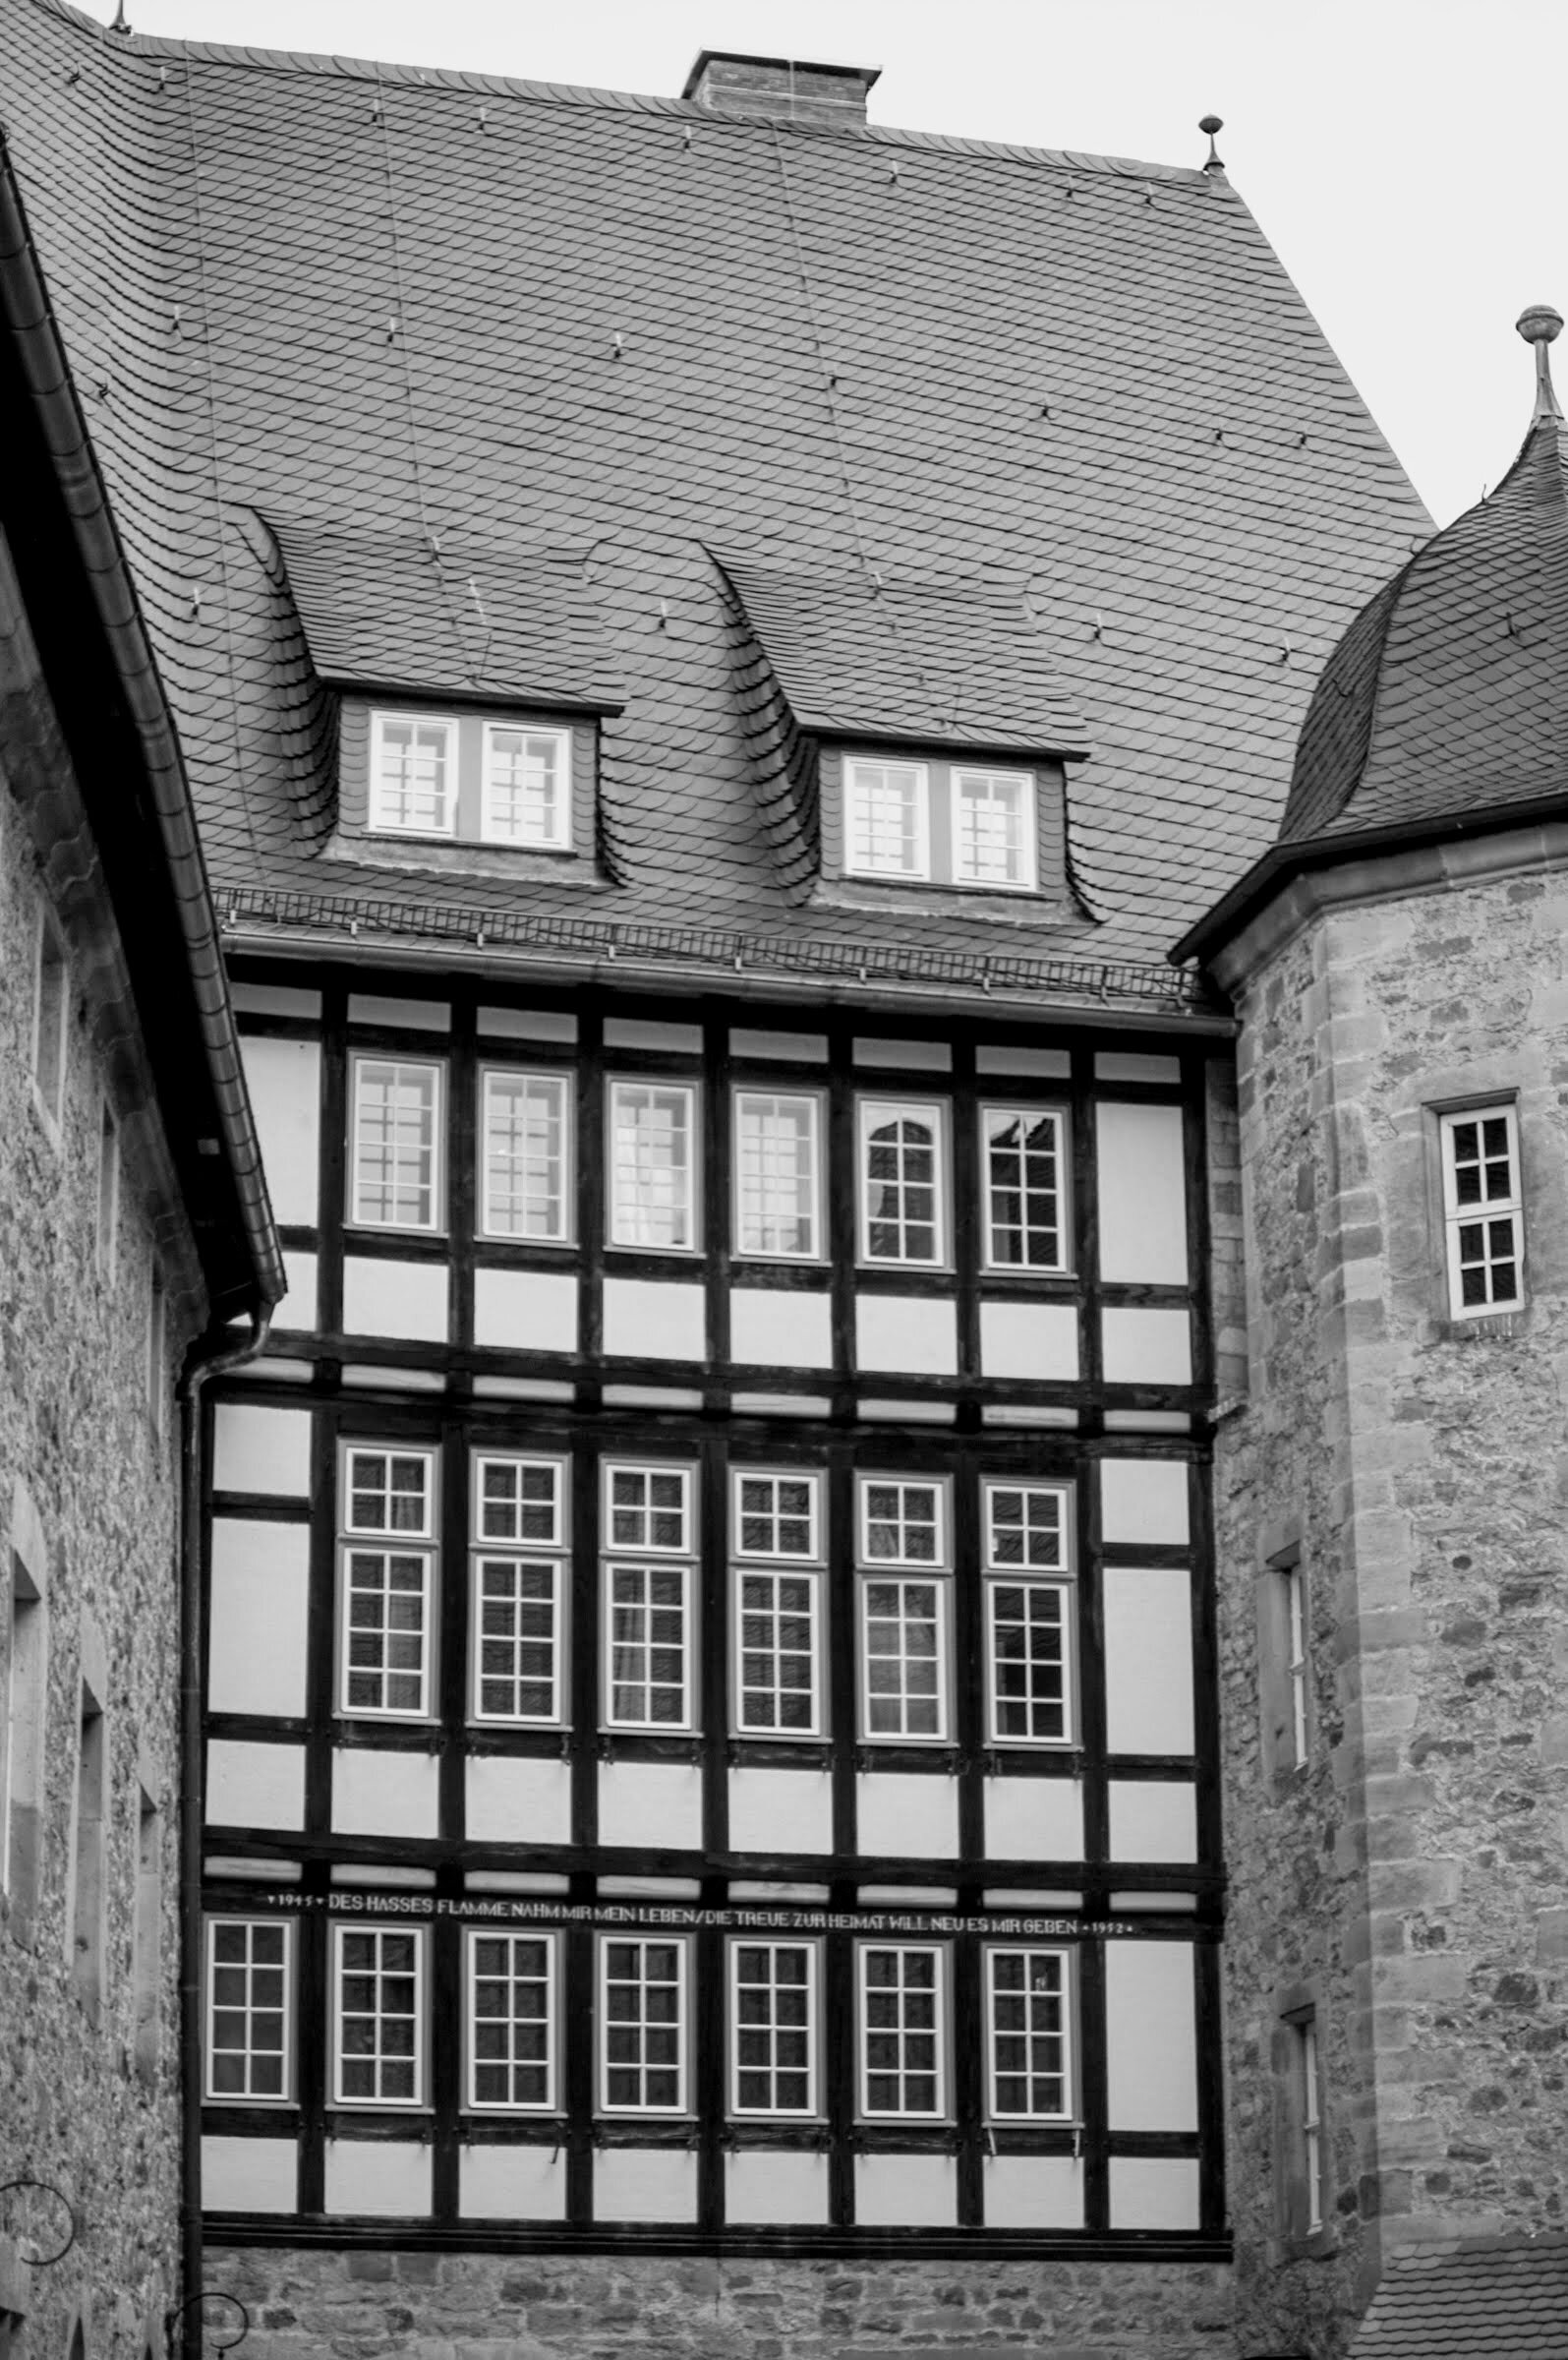 Lich, Germany